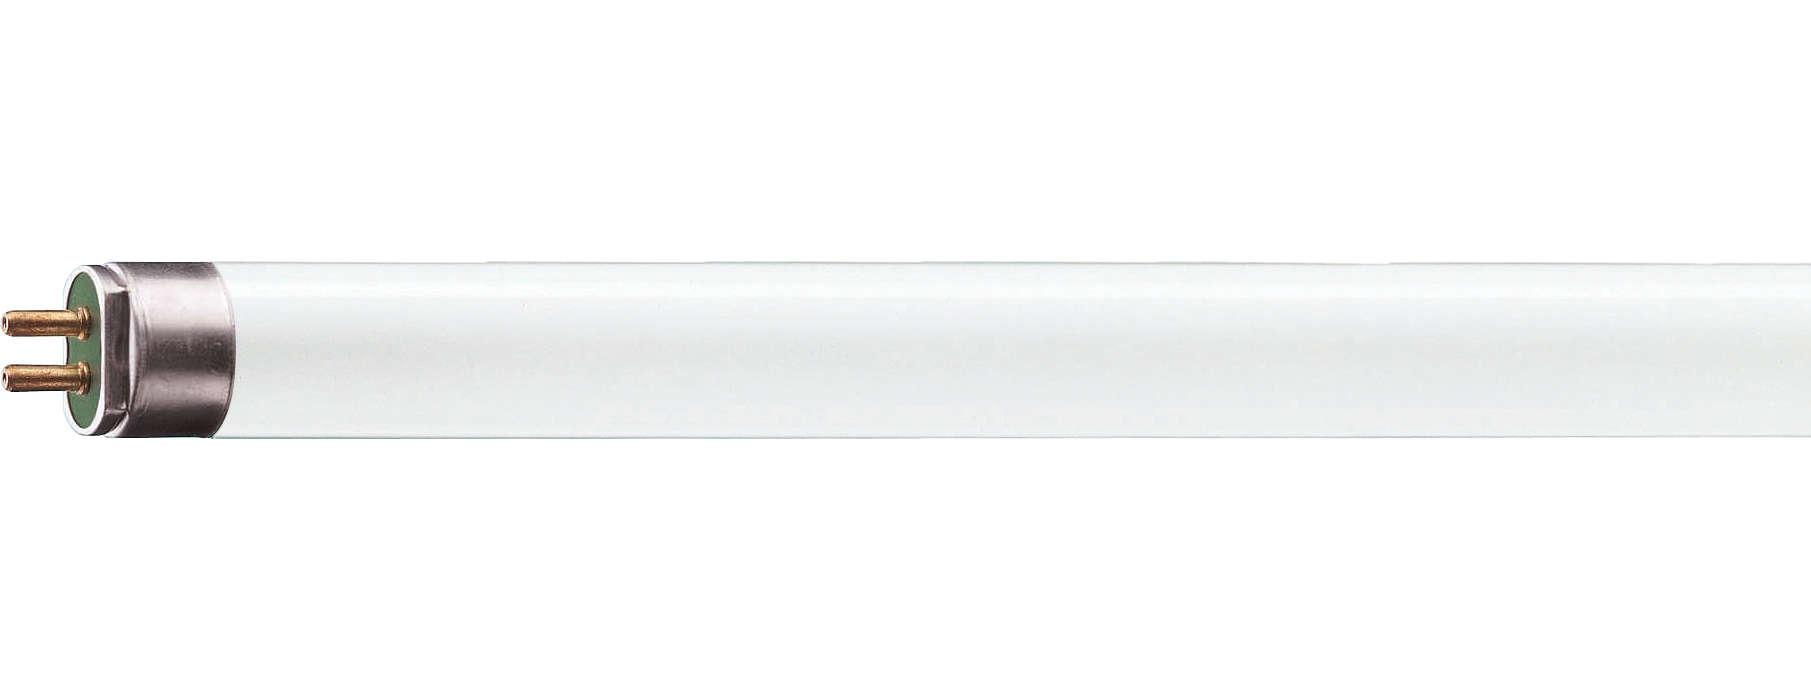 The world's brightest fluorescent lighting